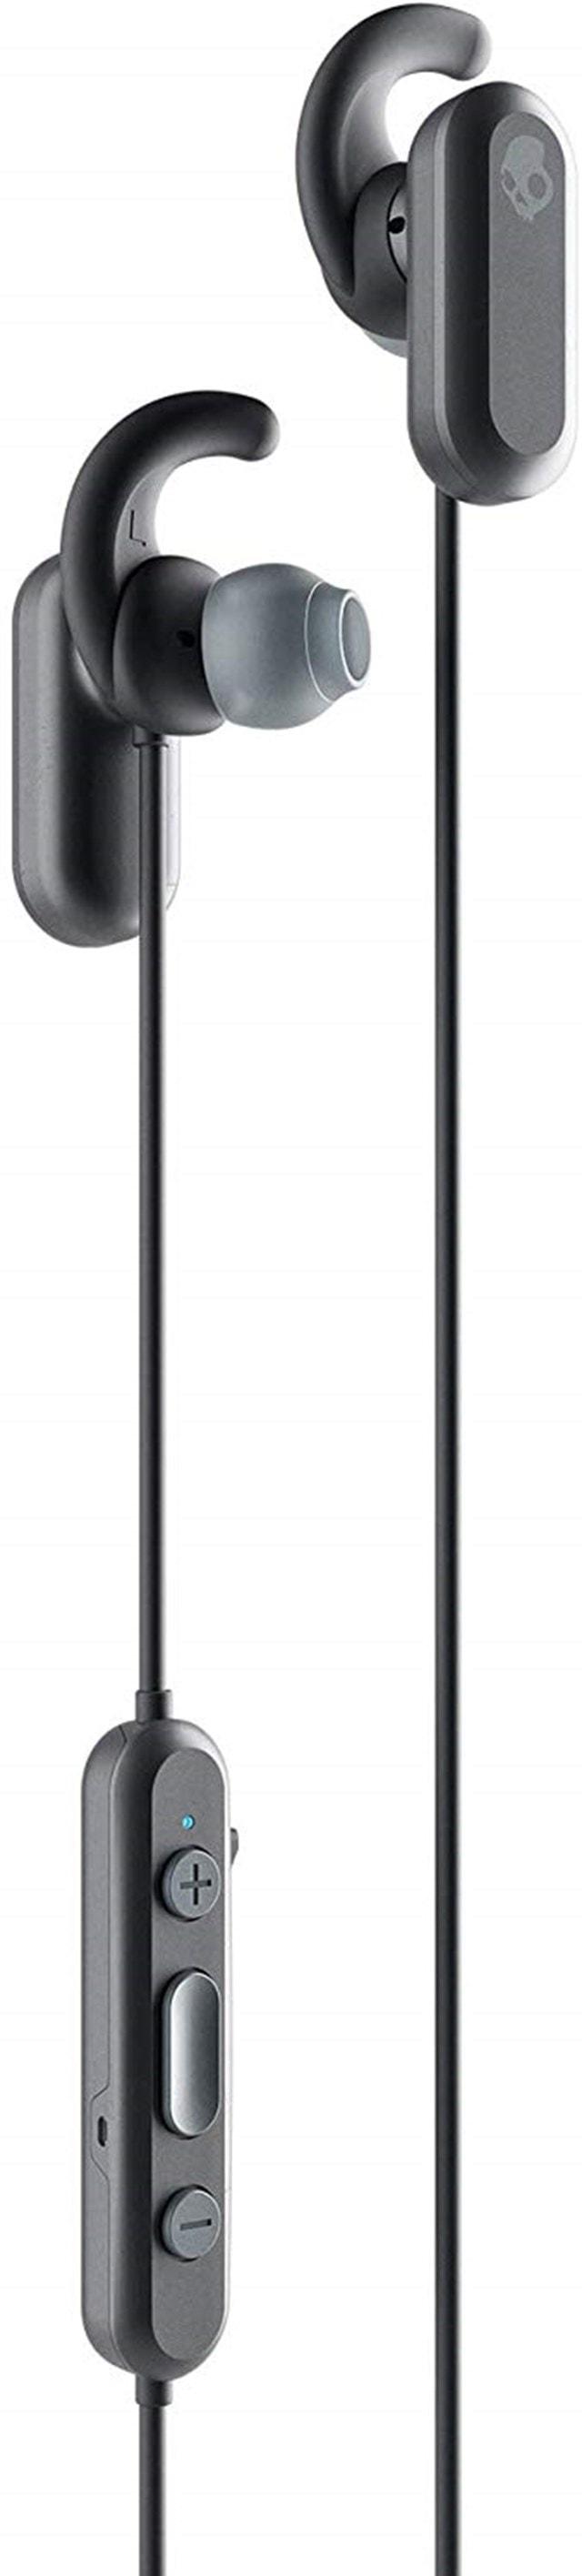 Skullcandy Method Black/Grey Active Noise Cancelling Bluetooth Sports Earphones - 2